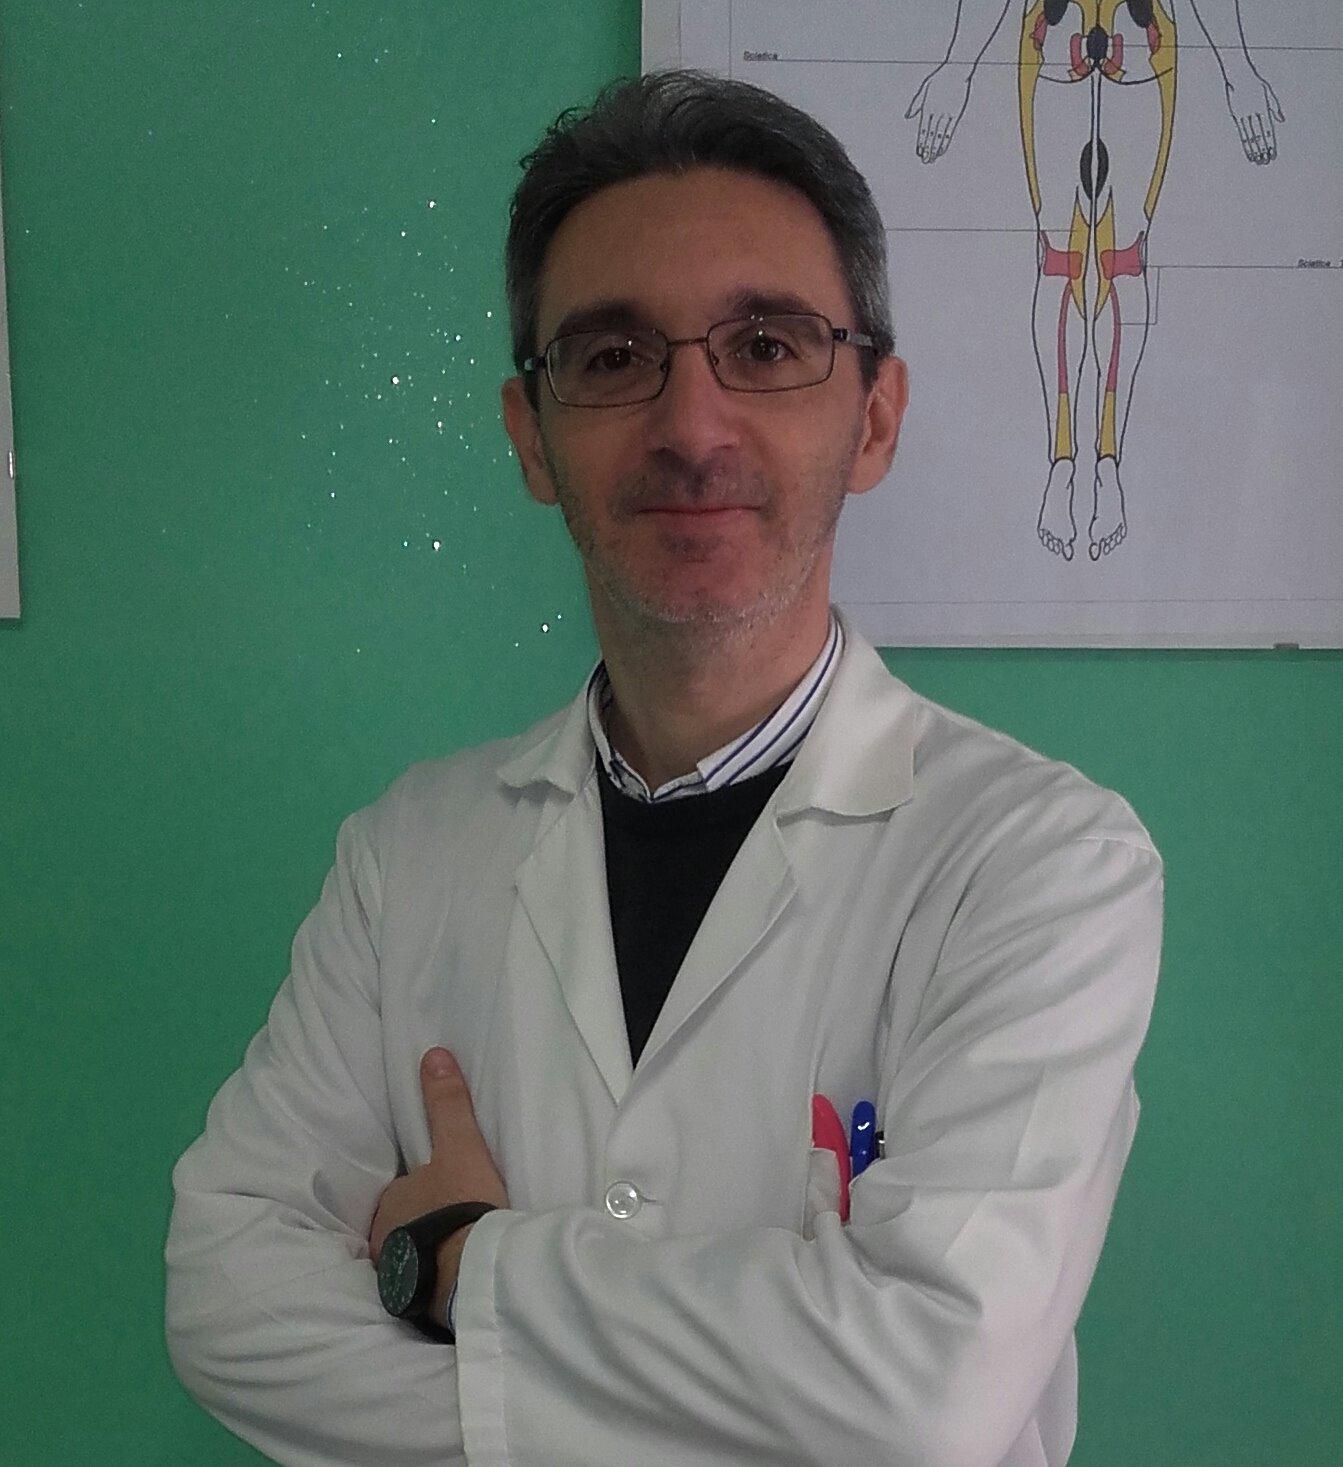 [OZONO TERAPIA] – Intervista al Dott Giovanni Santangelo – Medico Fisiatra